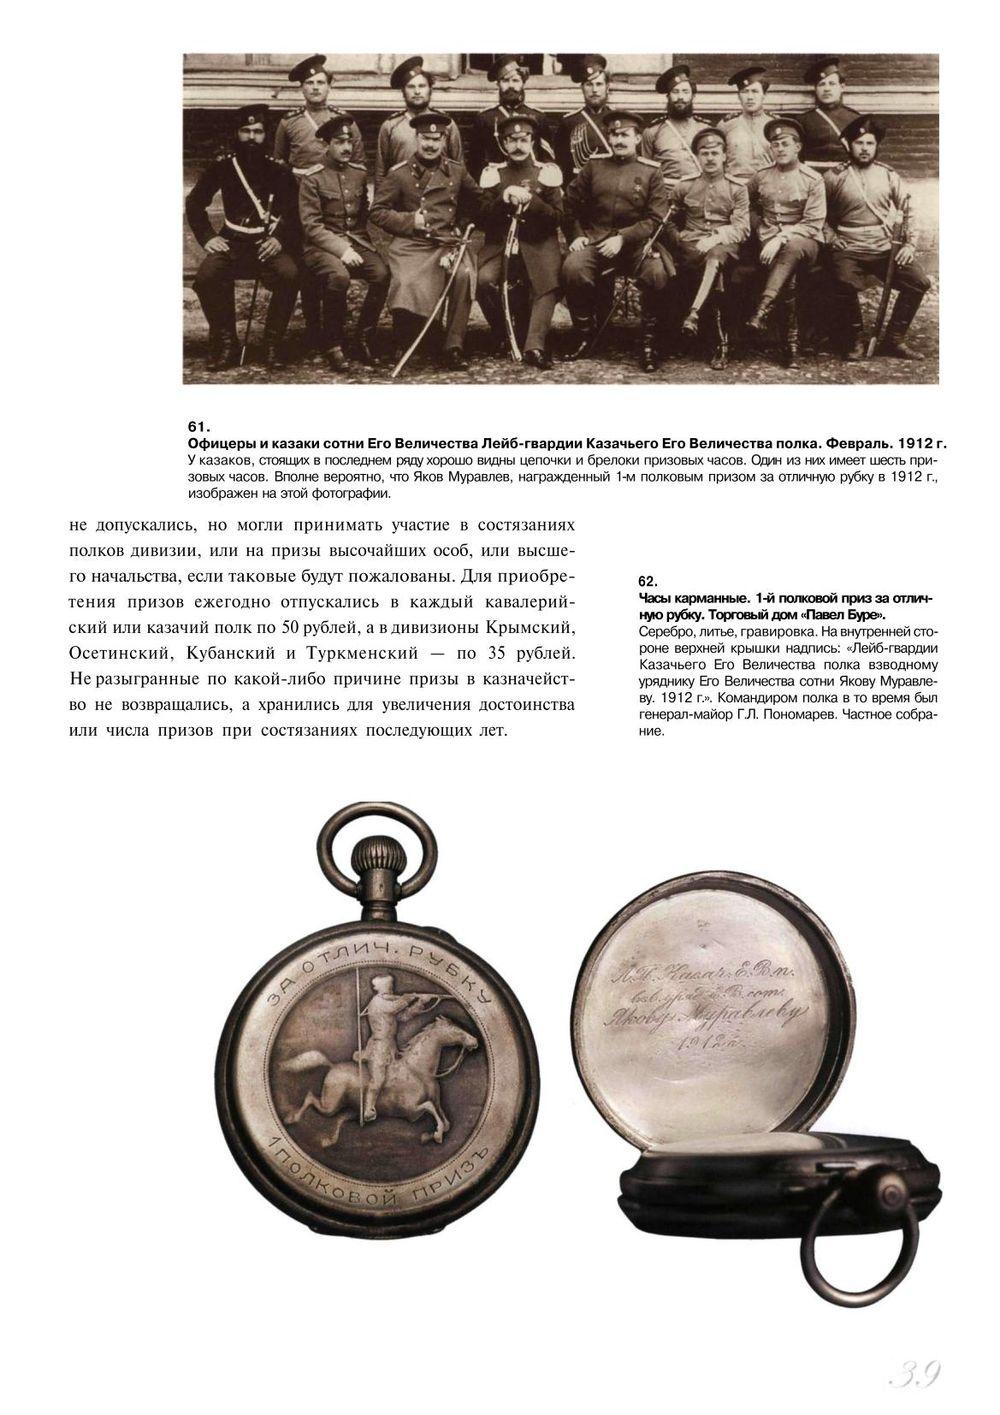 http://i4.imageban.ru/out/2015/08/14/54f680fa6b52fe09efa561176cec7a0c.jpg